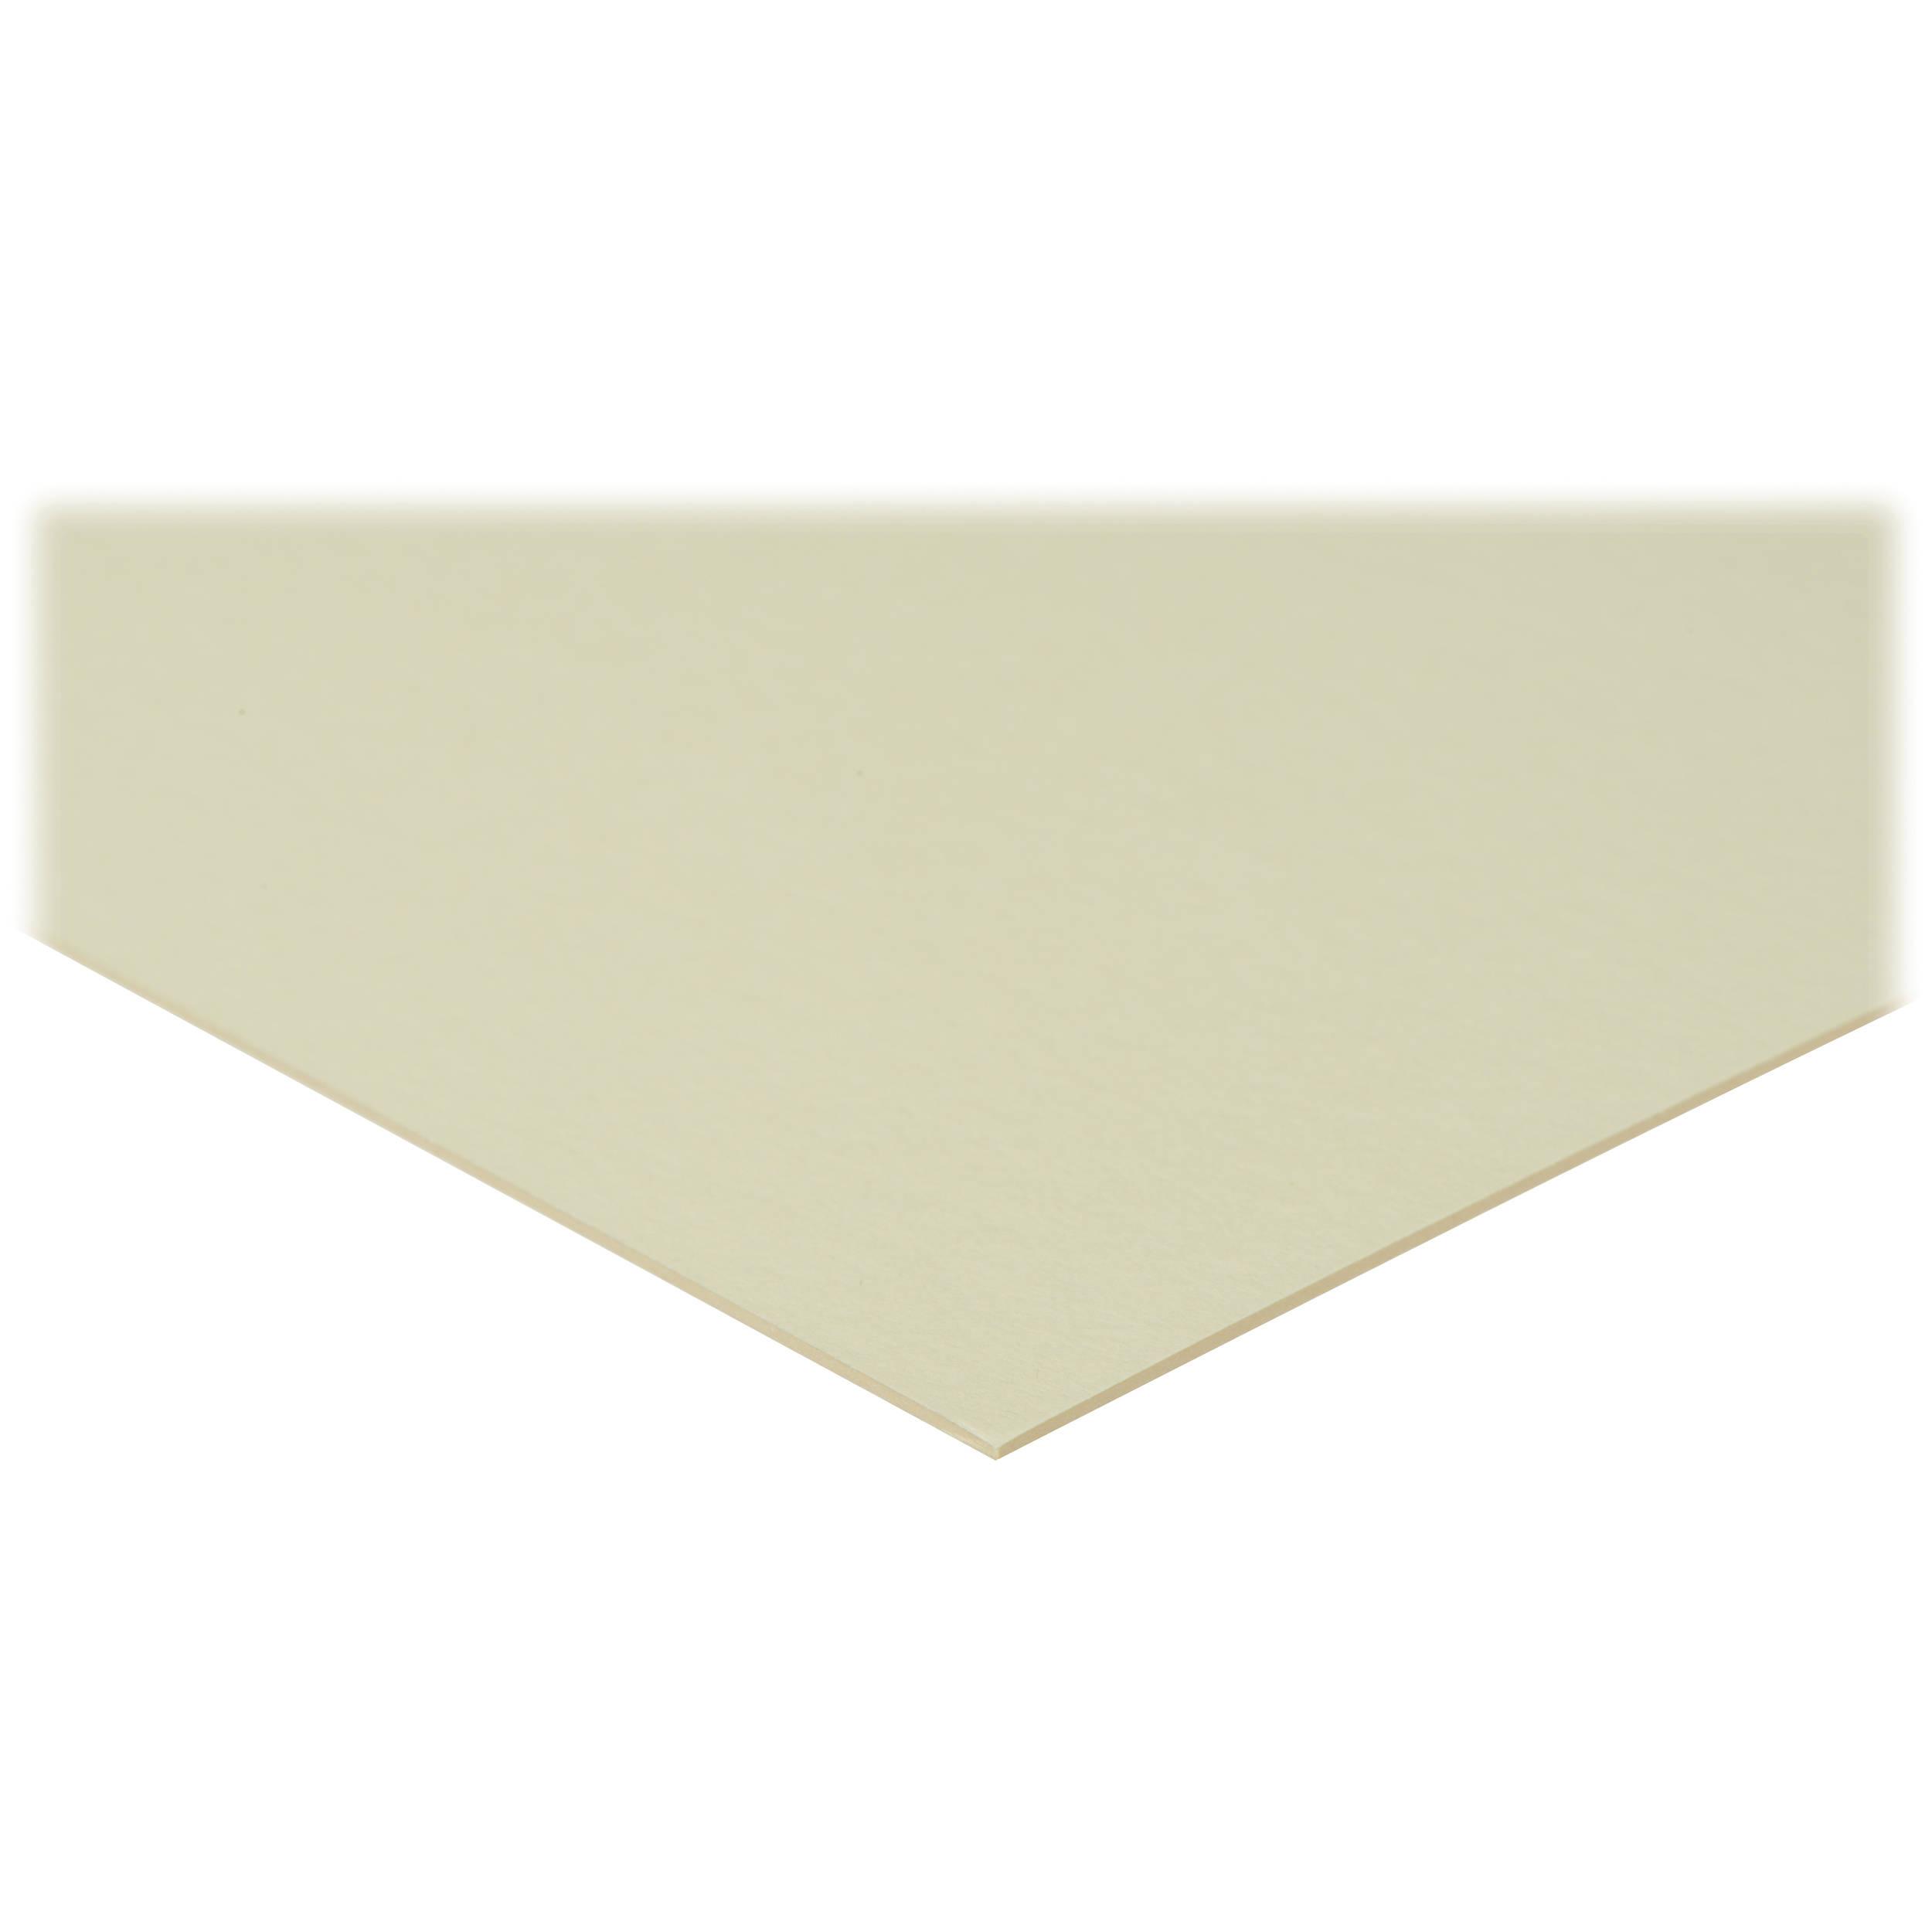 Savage Mat Board 16x20 Quot White Cream 100 Pack 15014 B Amp H